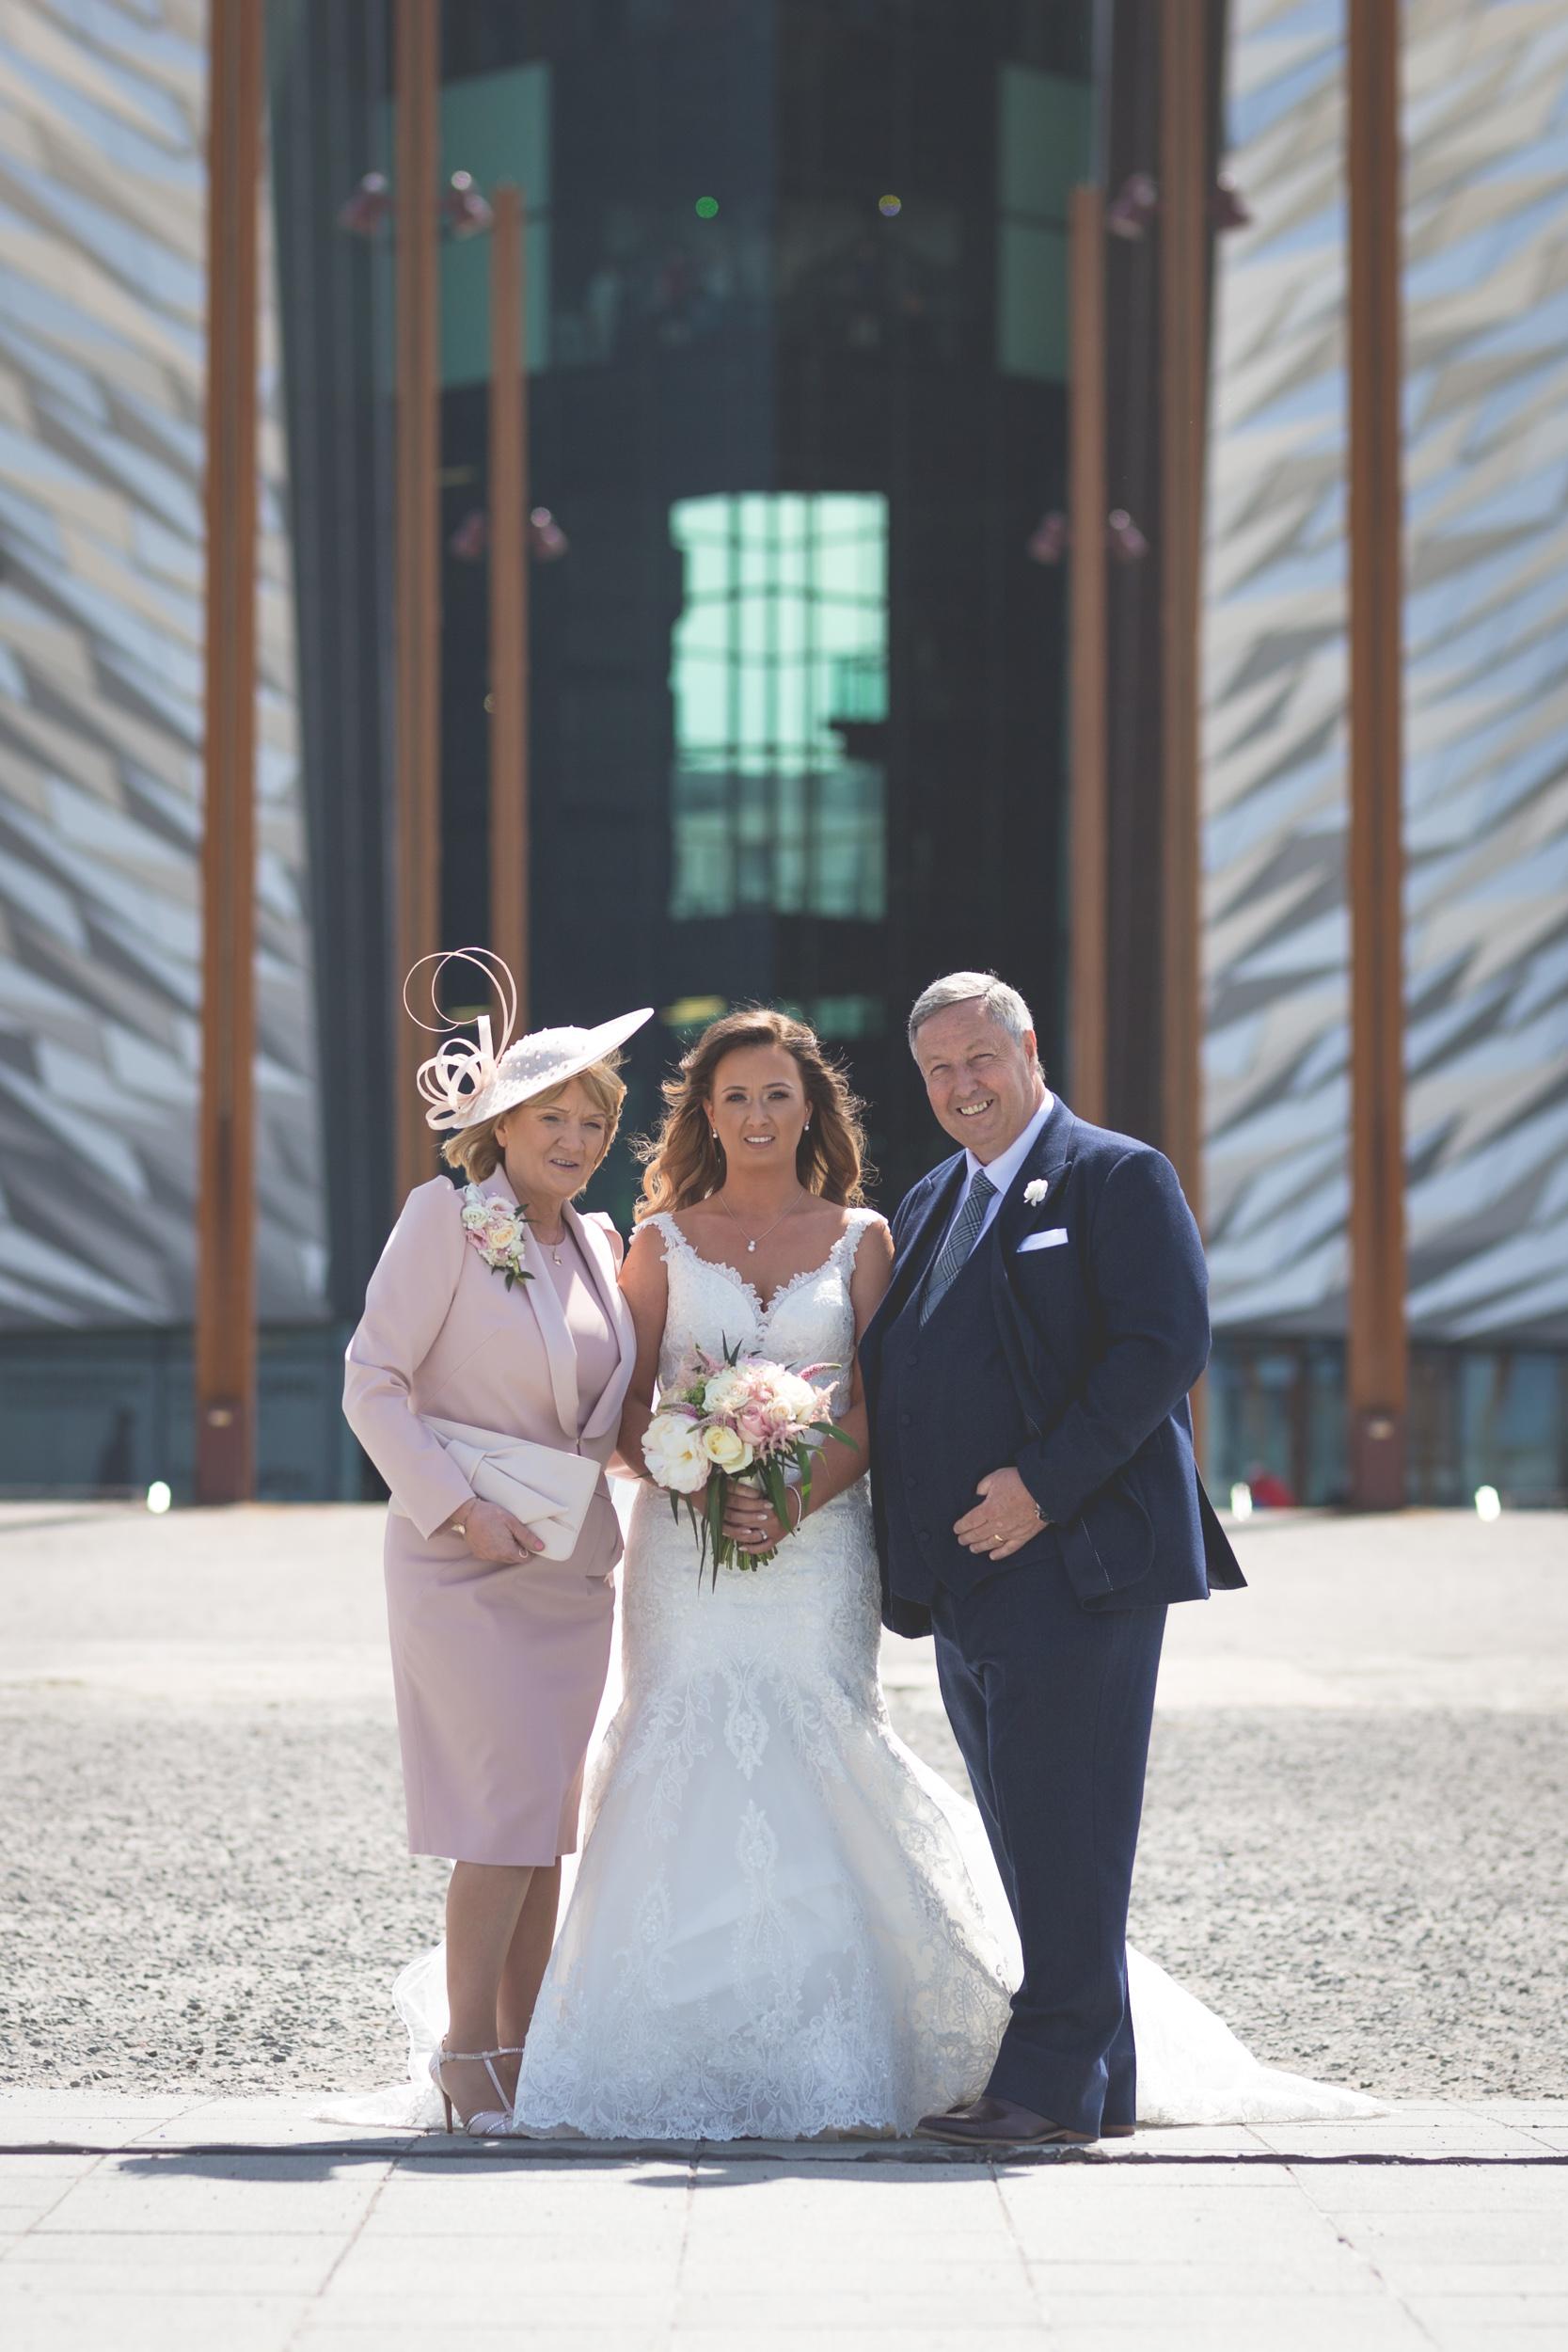 Brian McEwan   Northern Ireland Wedding Photographer   Rebecca & Michael   Portraits-35.jpg